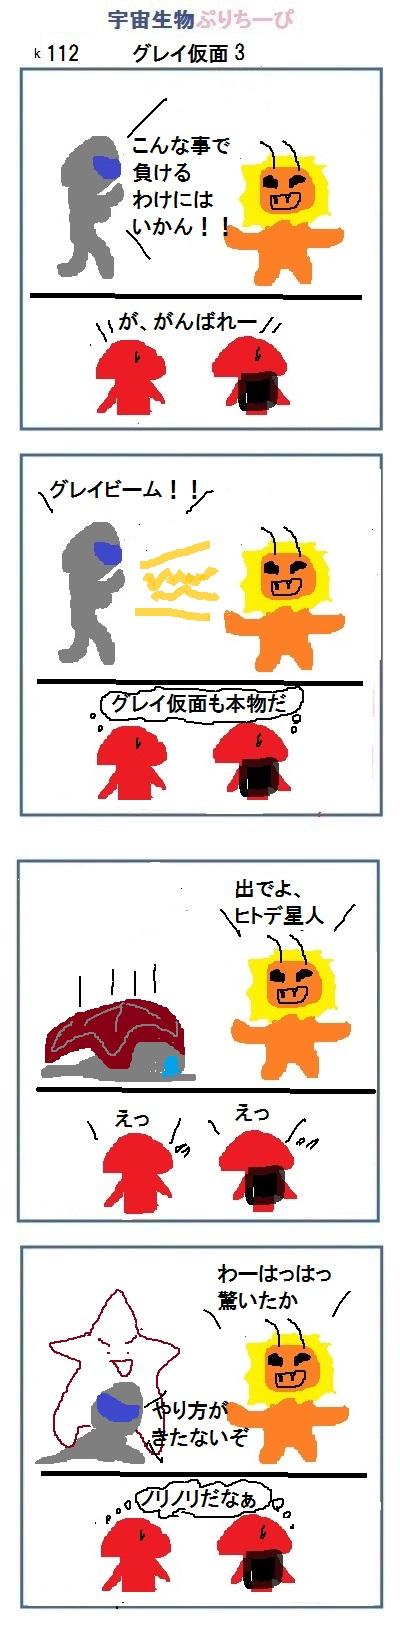 160925_k112.jpg